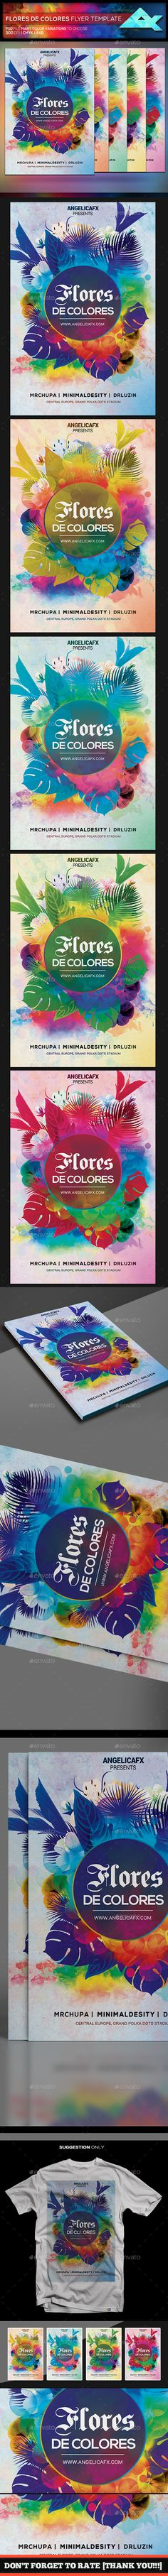 Colores de Flores Flyer Template — Photoshop PSD #sounds #music • Available here → https://graphicriver.net/item/colores-de-flores-flyer-template/19814789?ref=pxcr